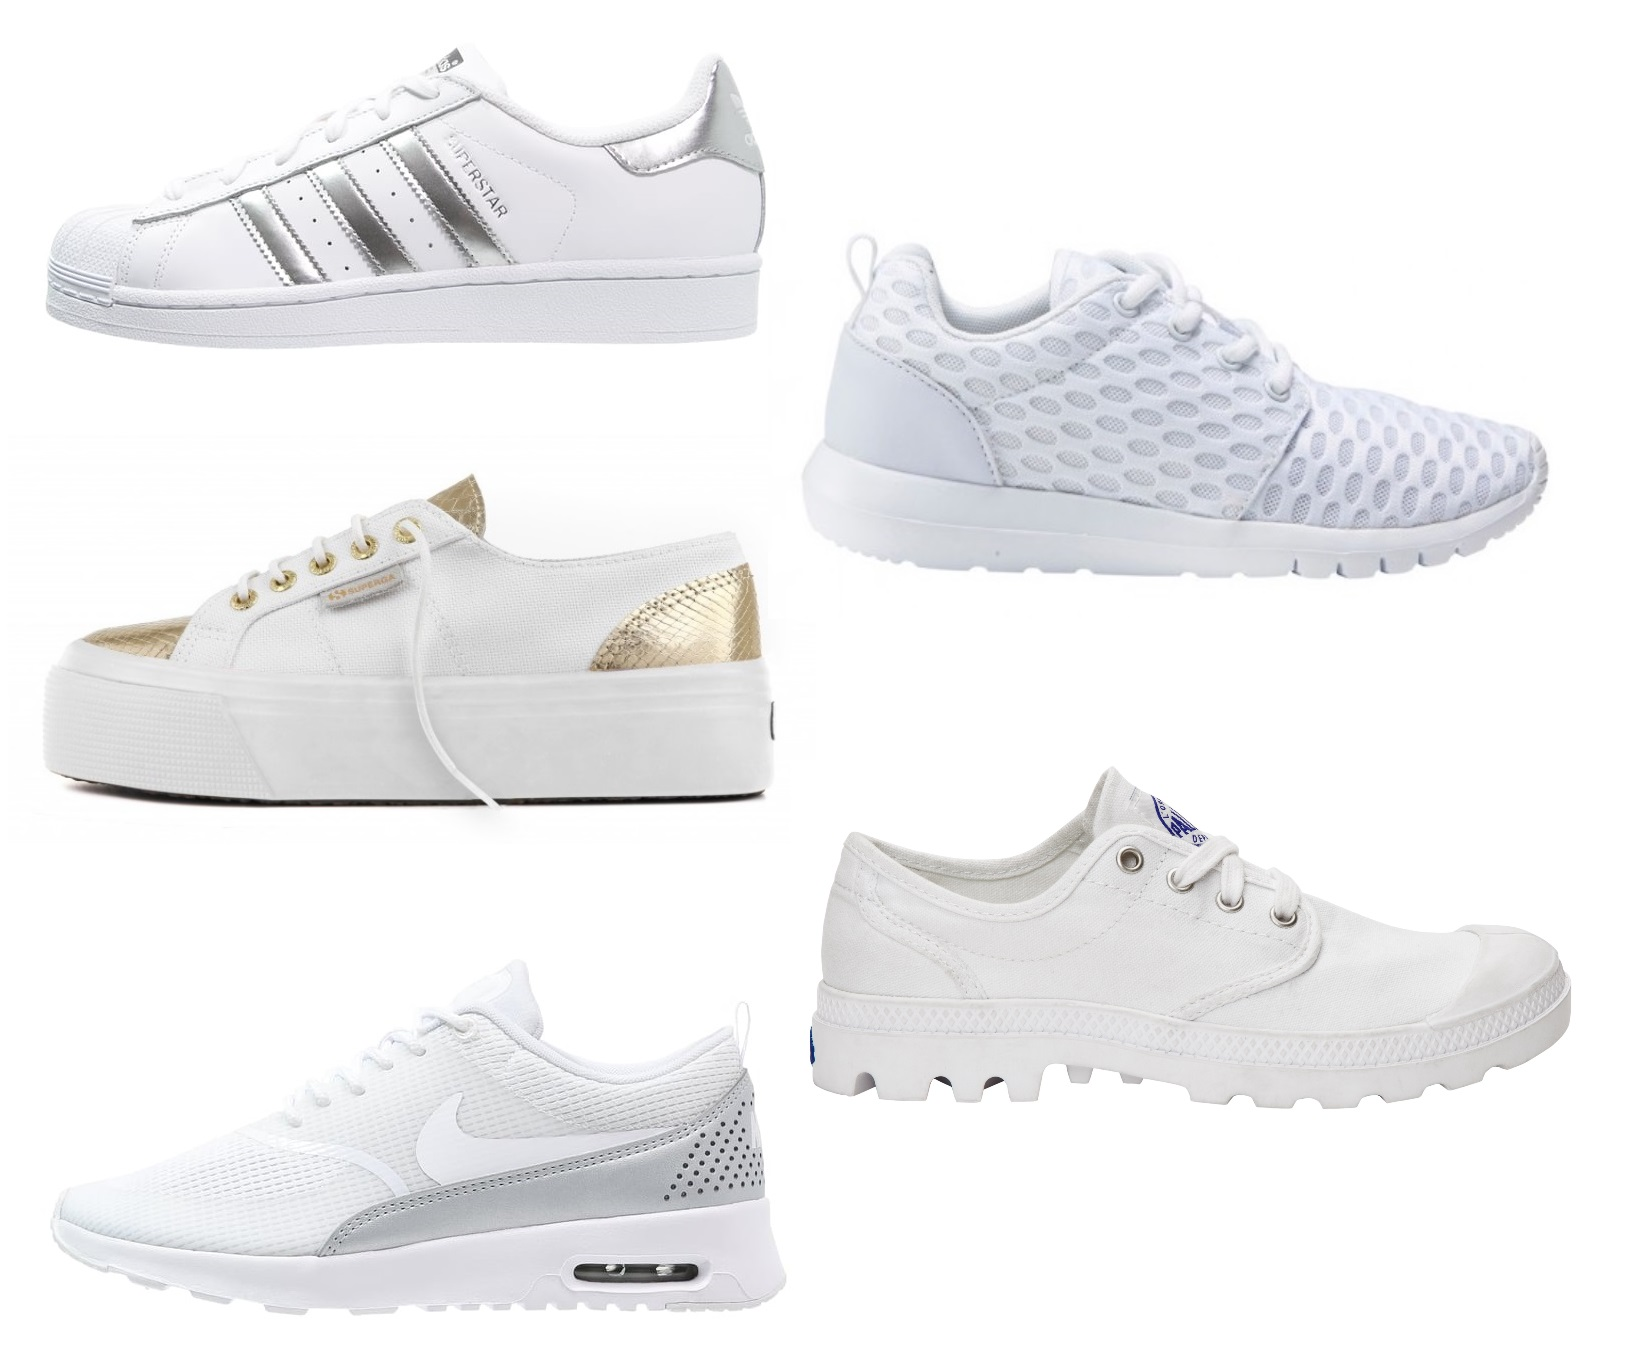 Tag Zalando Adidas Kengät — waldon.protese-de-silicone.info ccce34debe